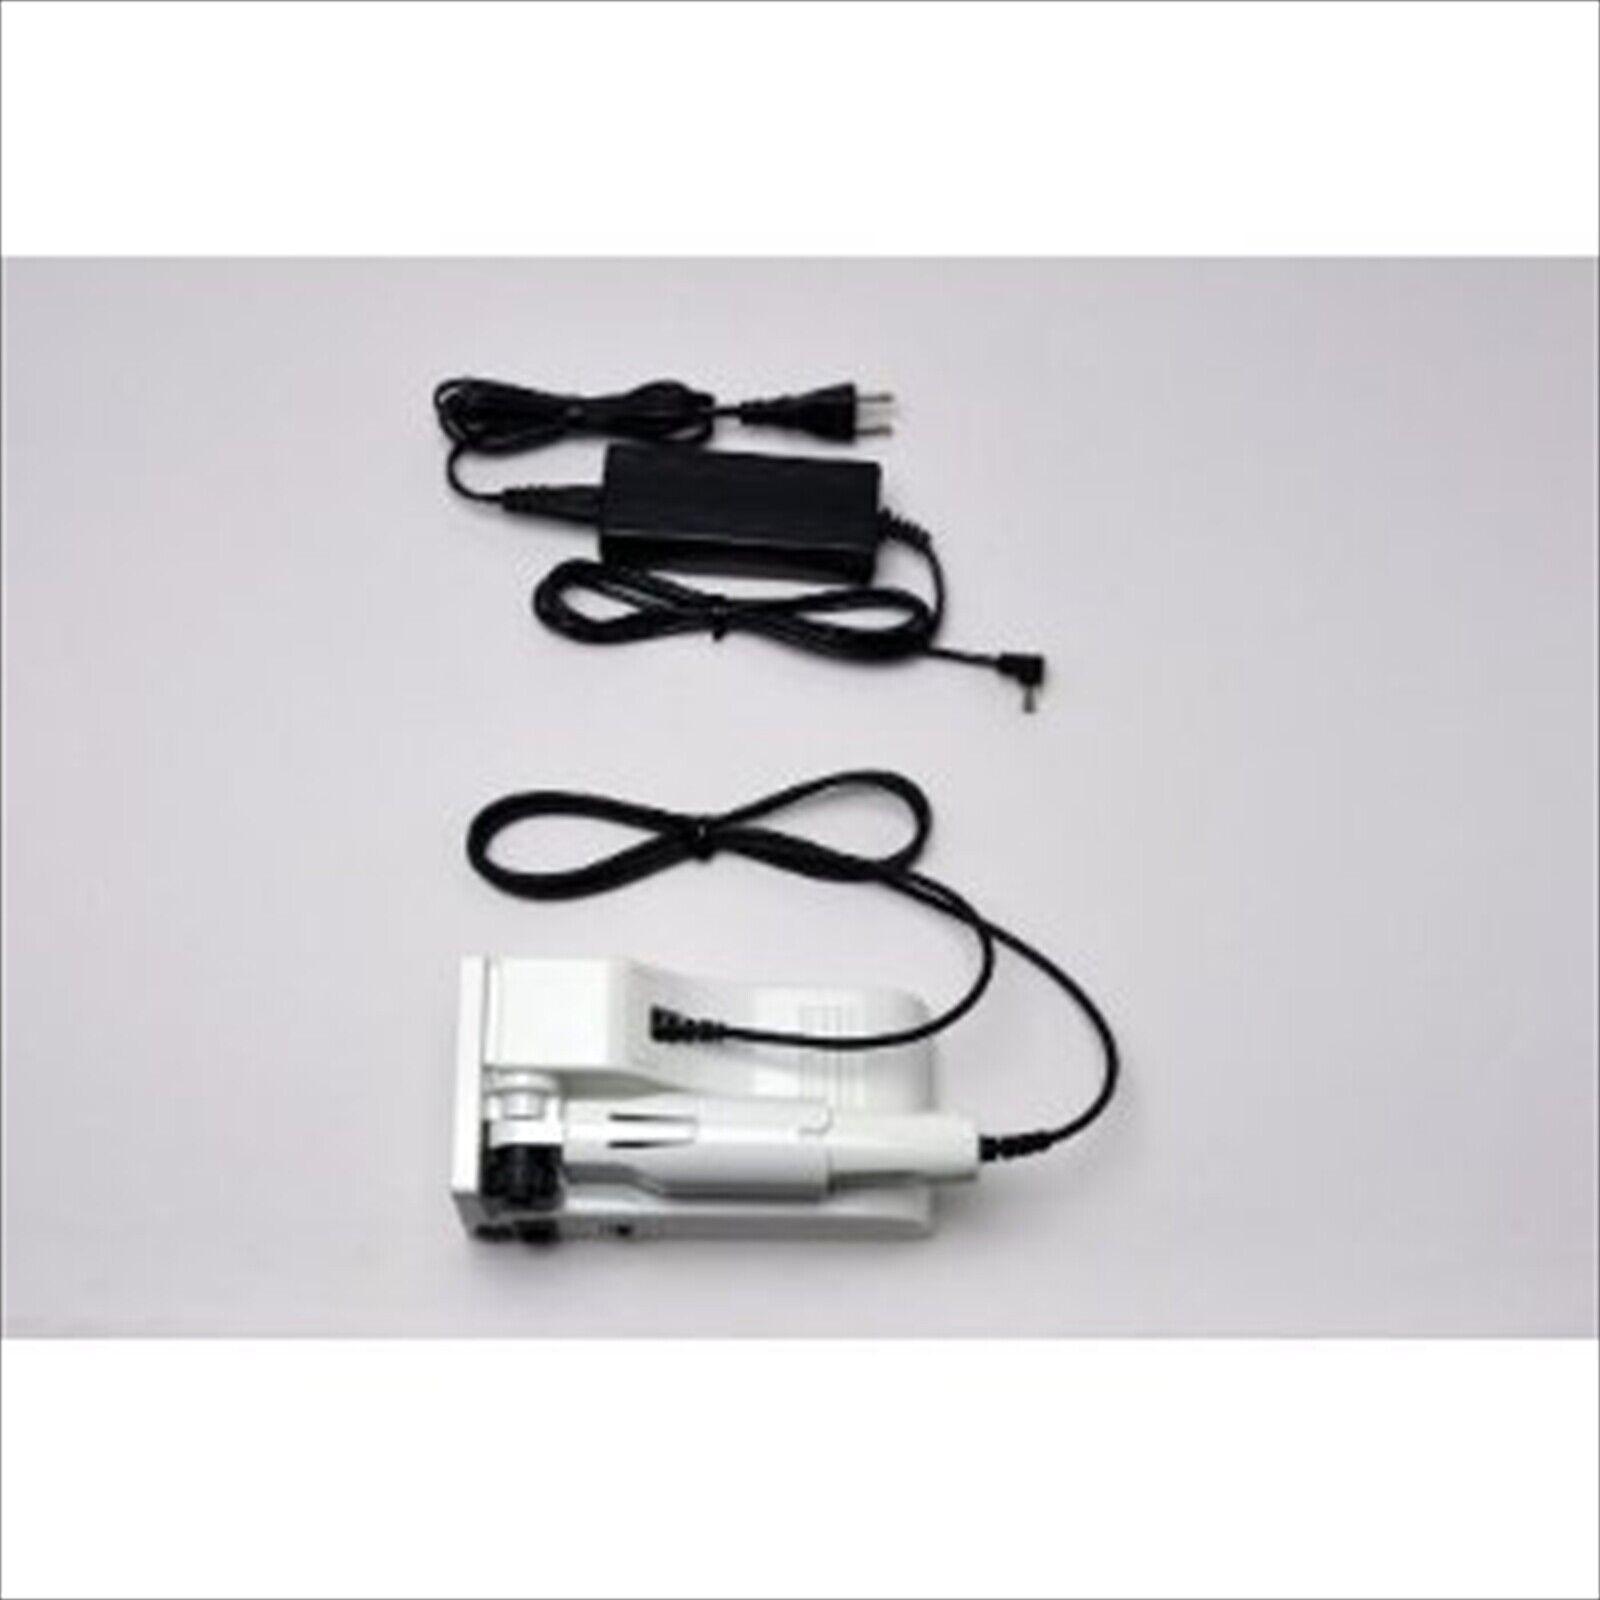 US-gadget ZO-41 II 2 Ultrasonic Cutter White AC100V-240V